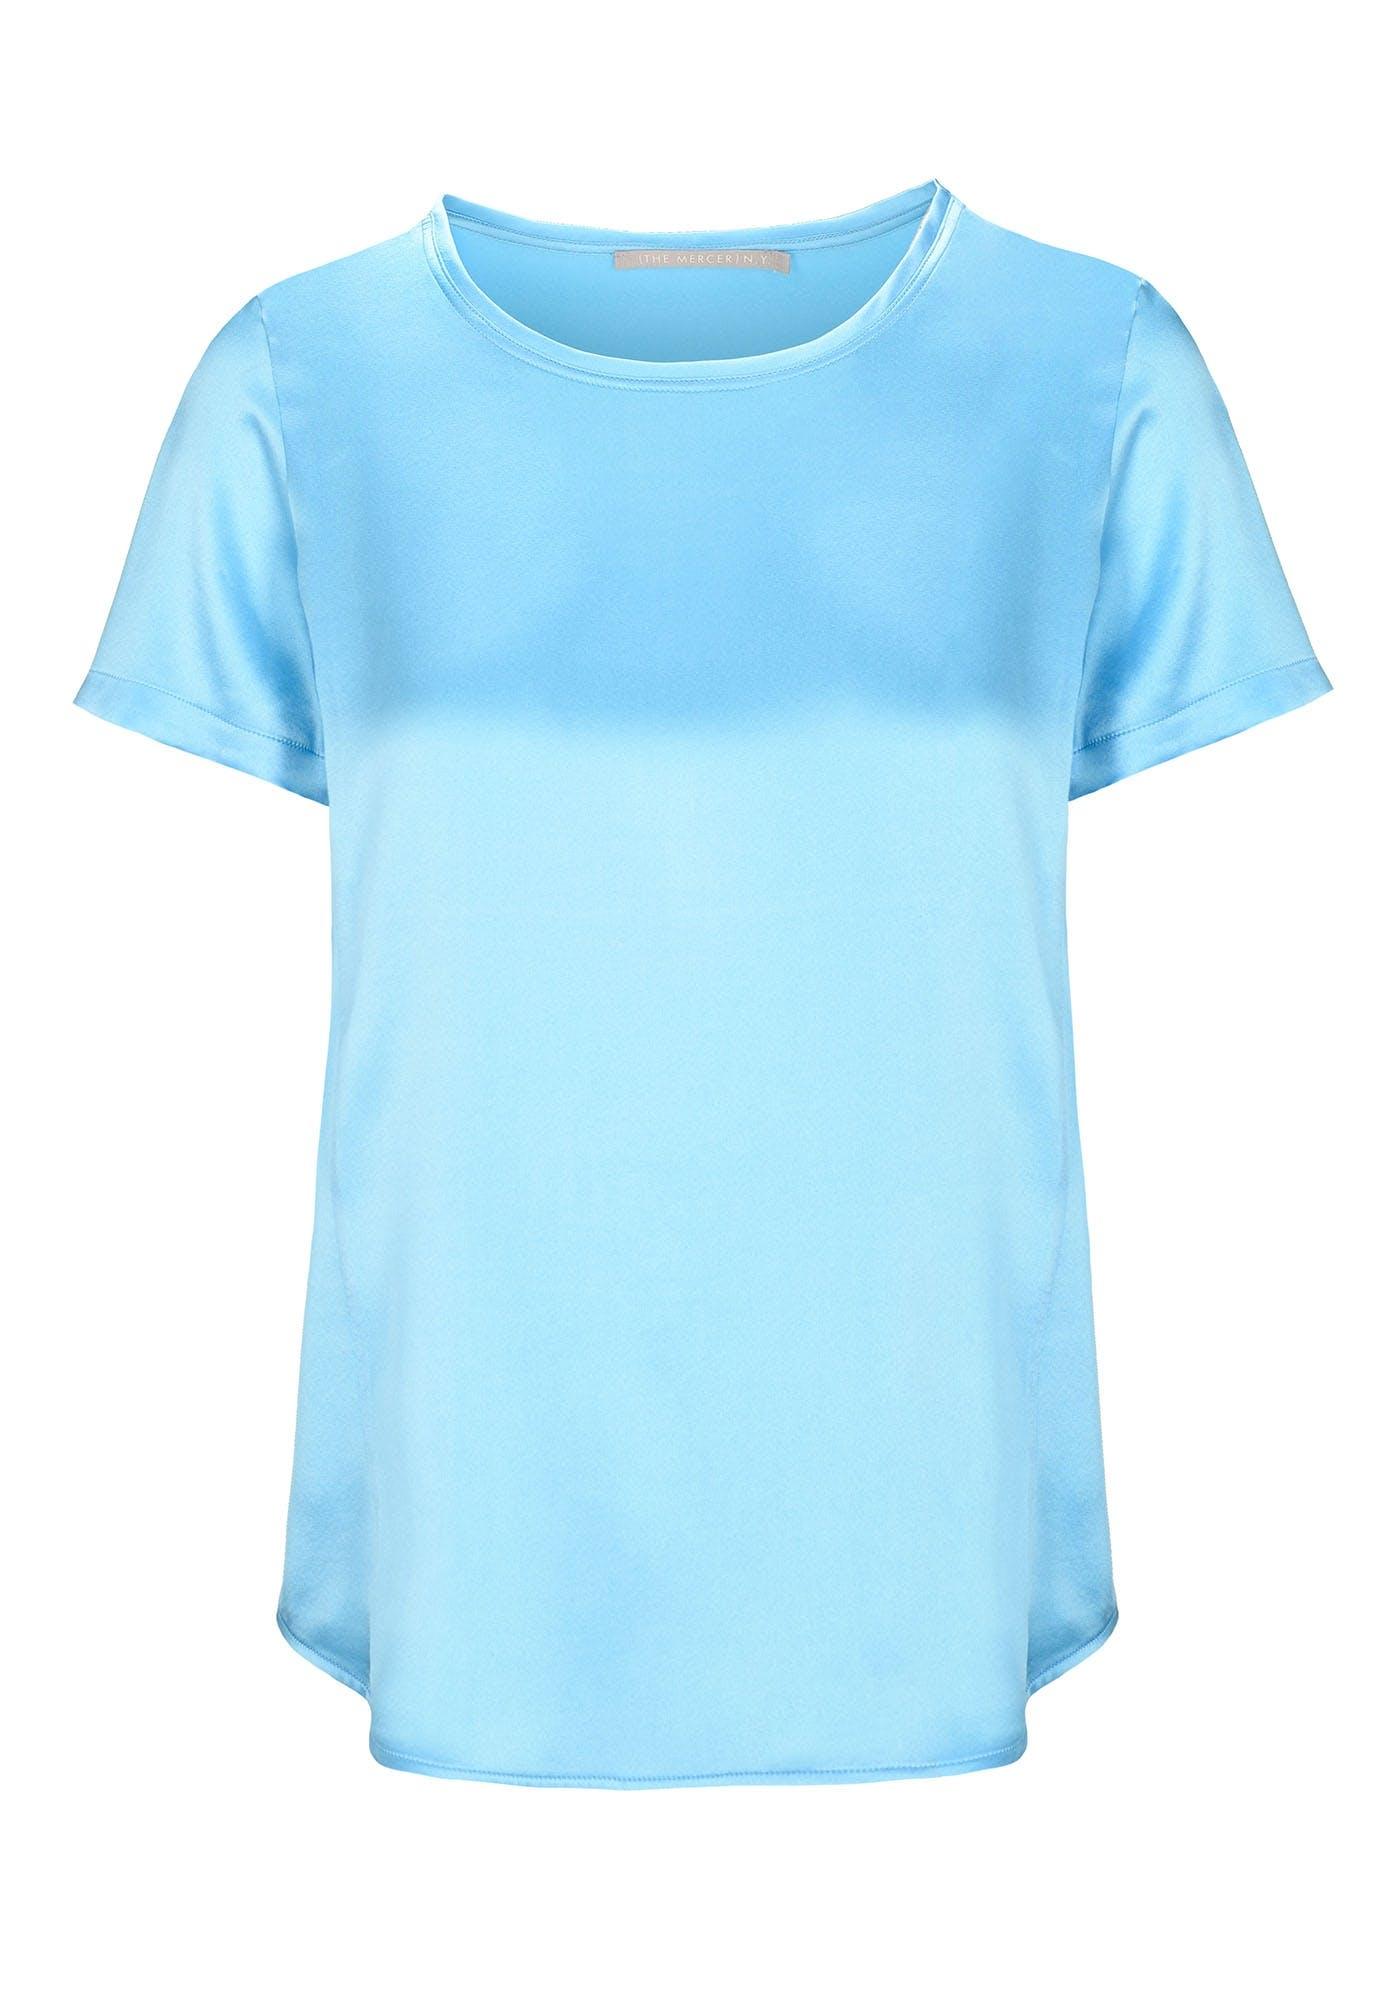 Satin Silk Shirt - Pool